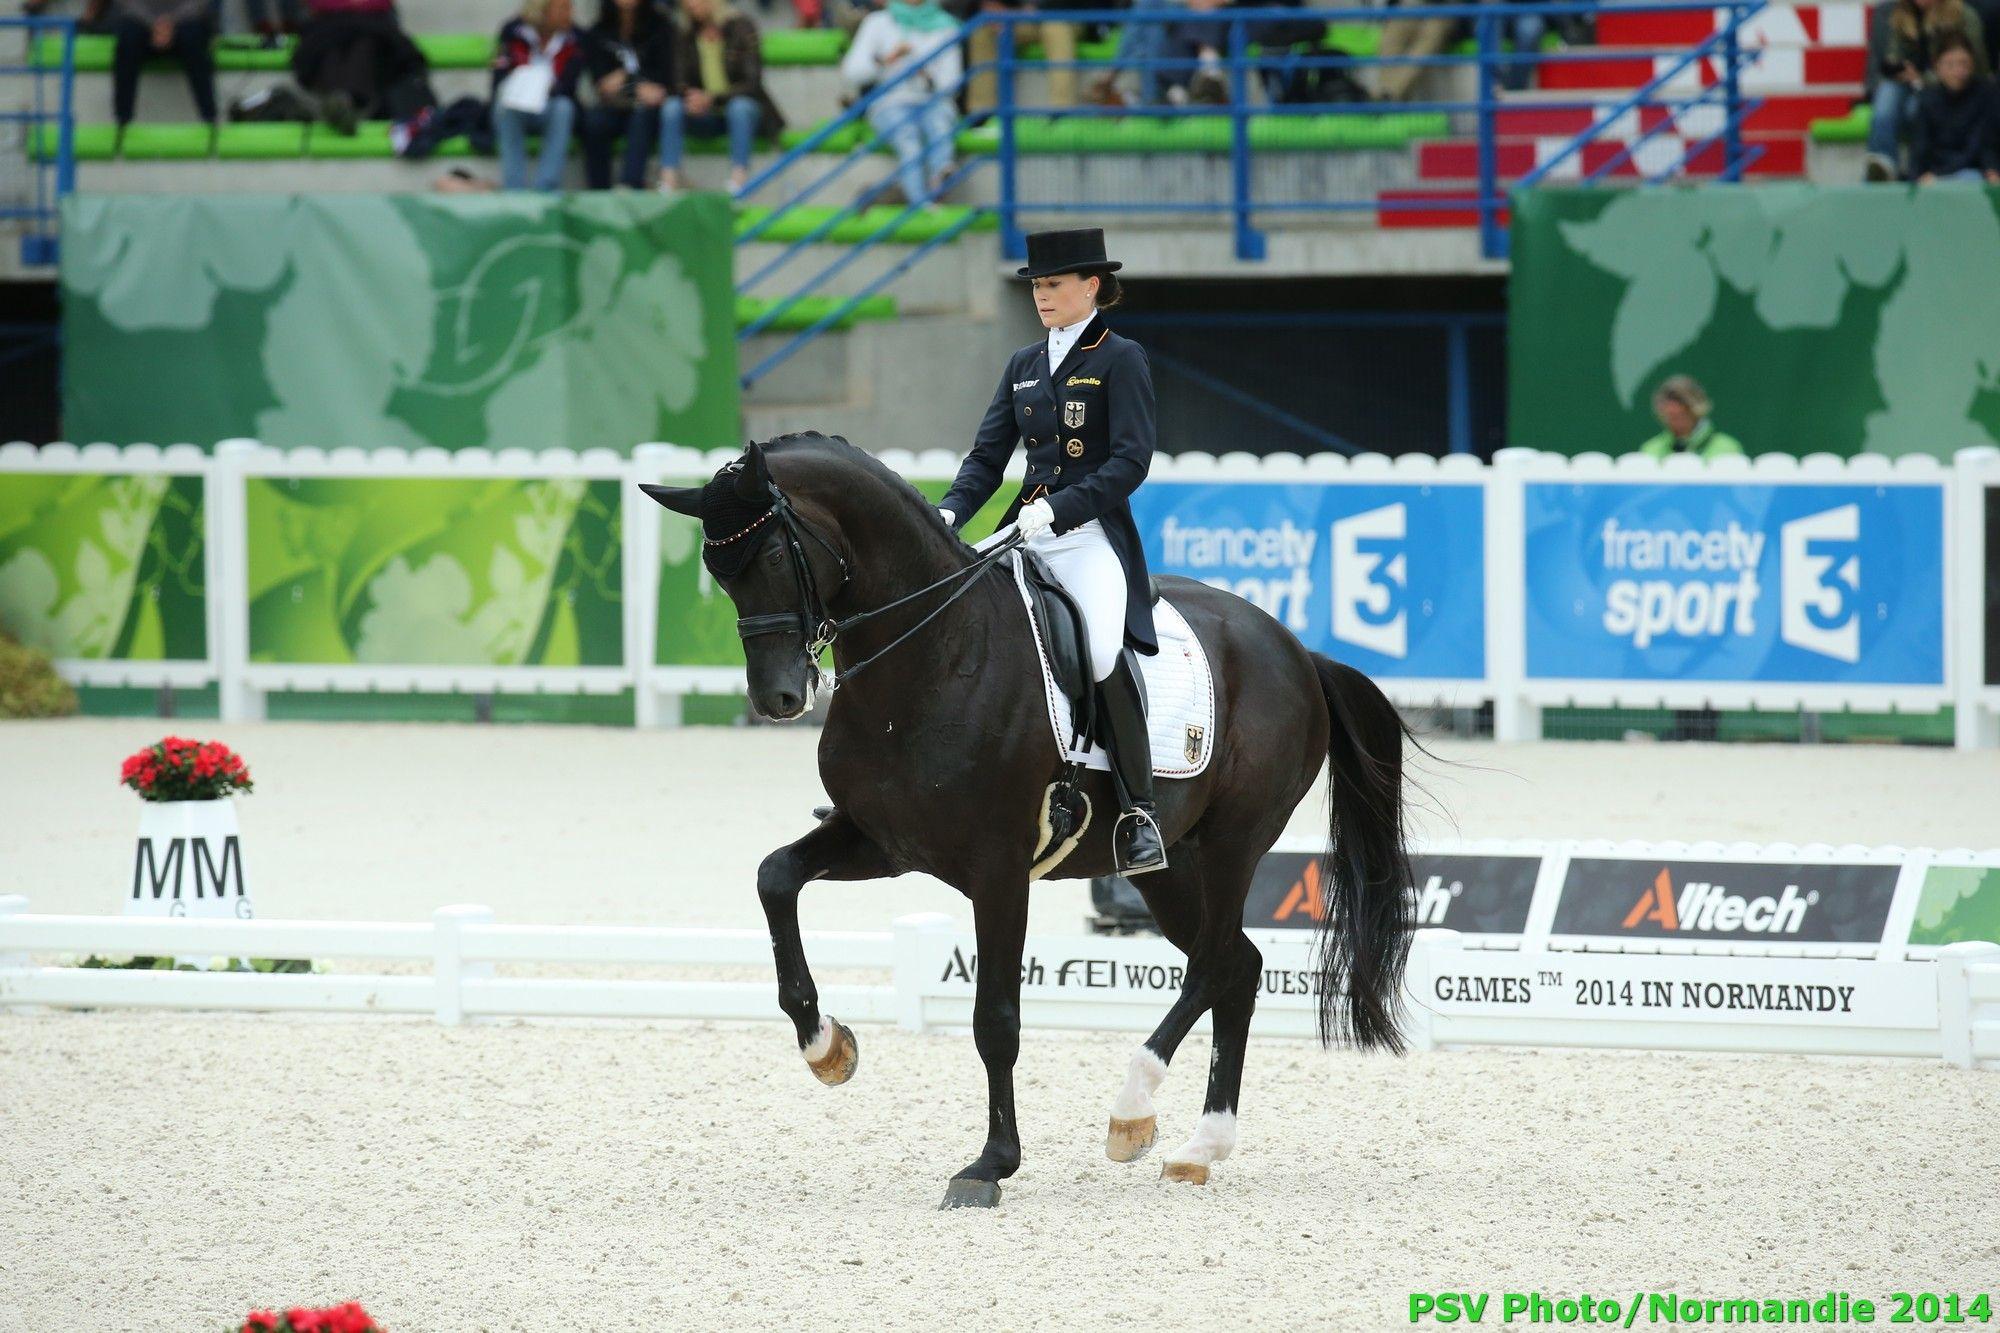 Dressage Kristina Sprehe Desperados Frh Ger August 27th Copyright Psv Photo Dressage Horses Horses Dressage